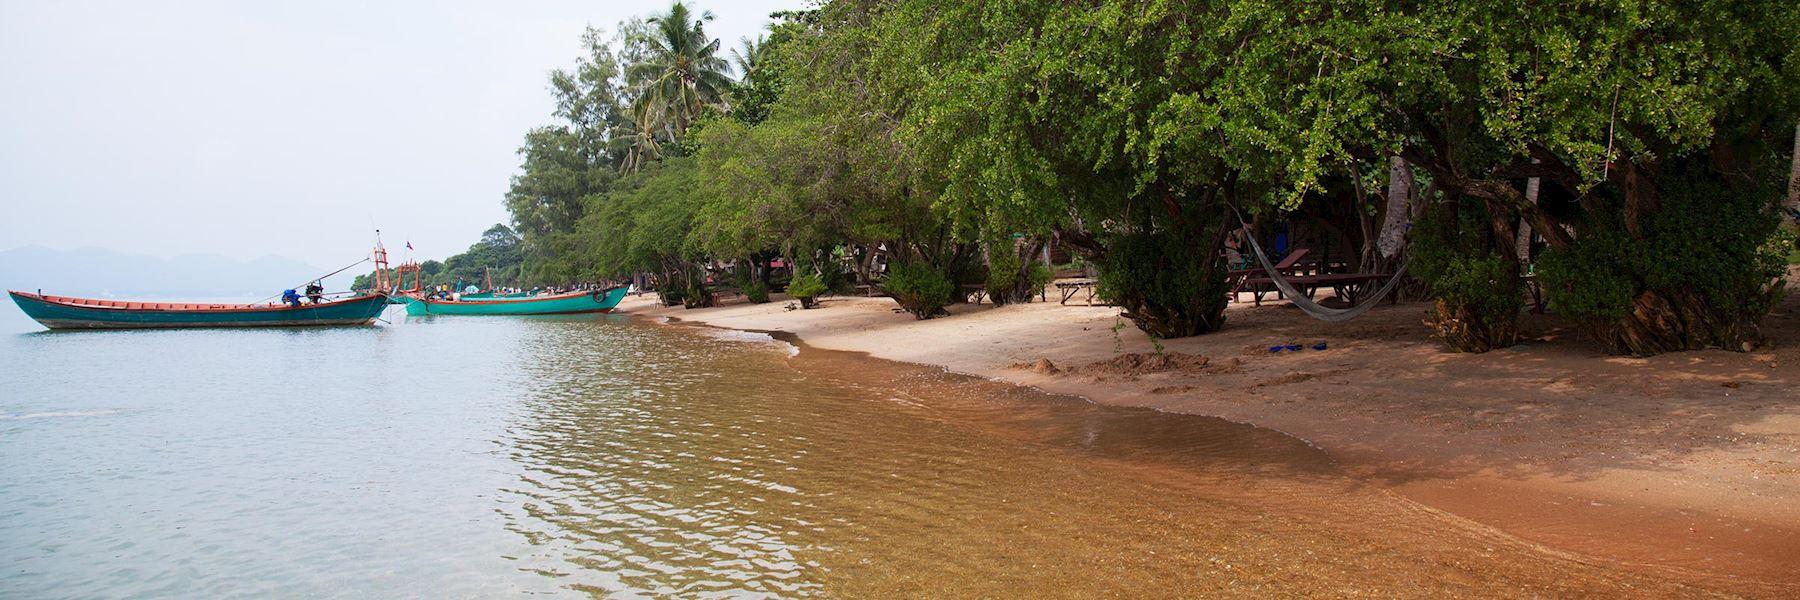 Visit Kep, Cambodia